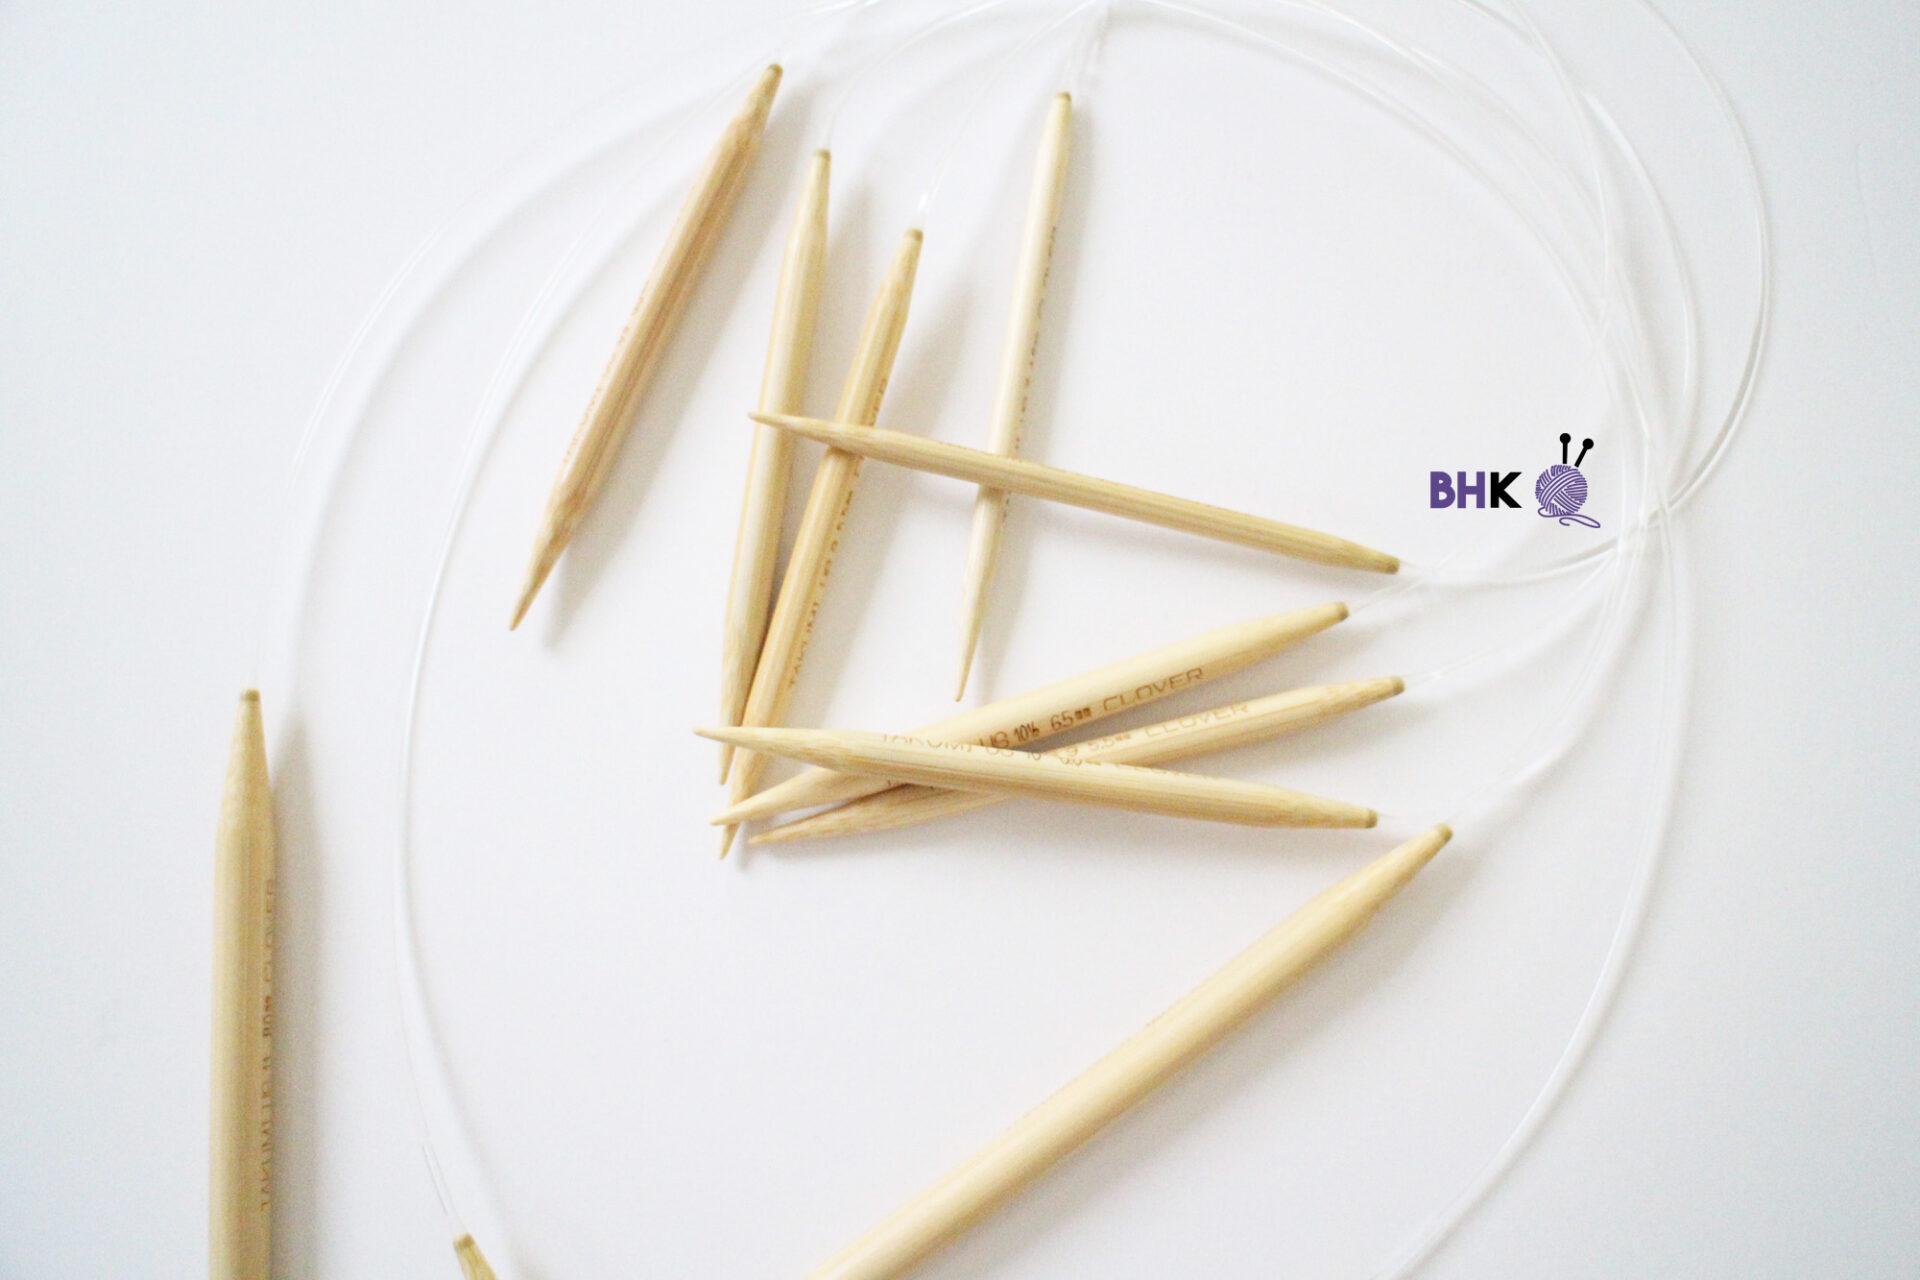 Clover Takumi Circular Knitting Needles Review